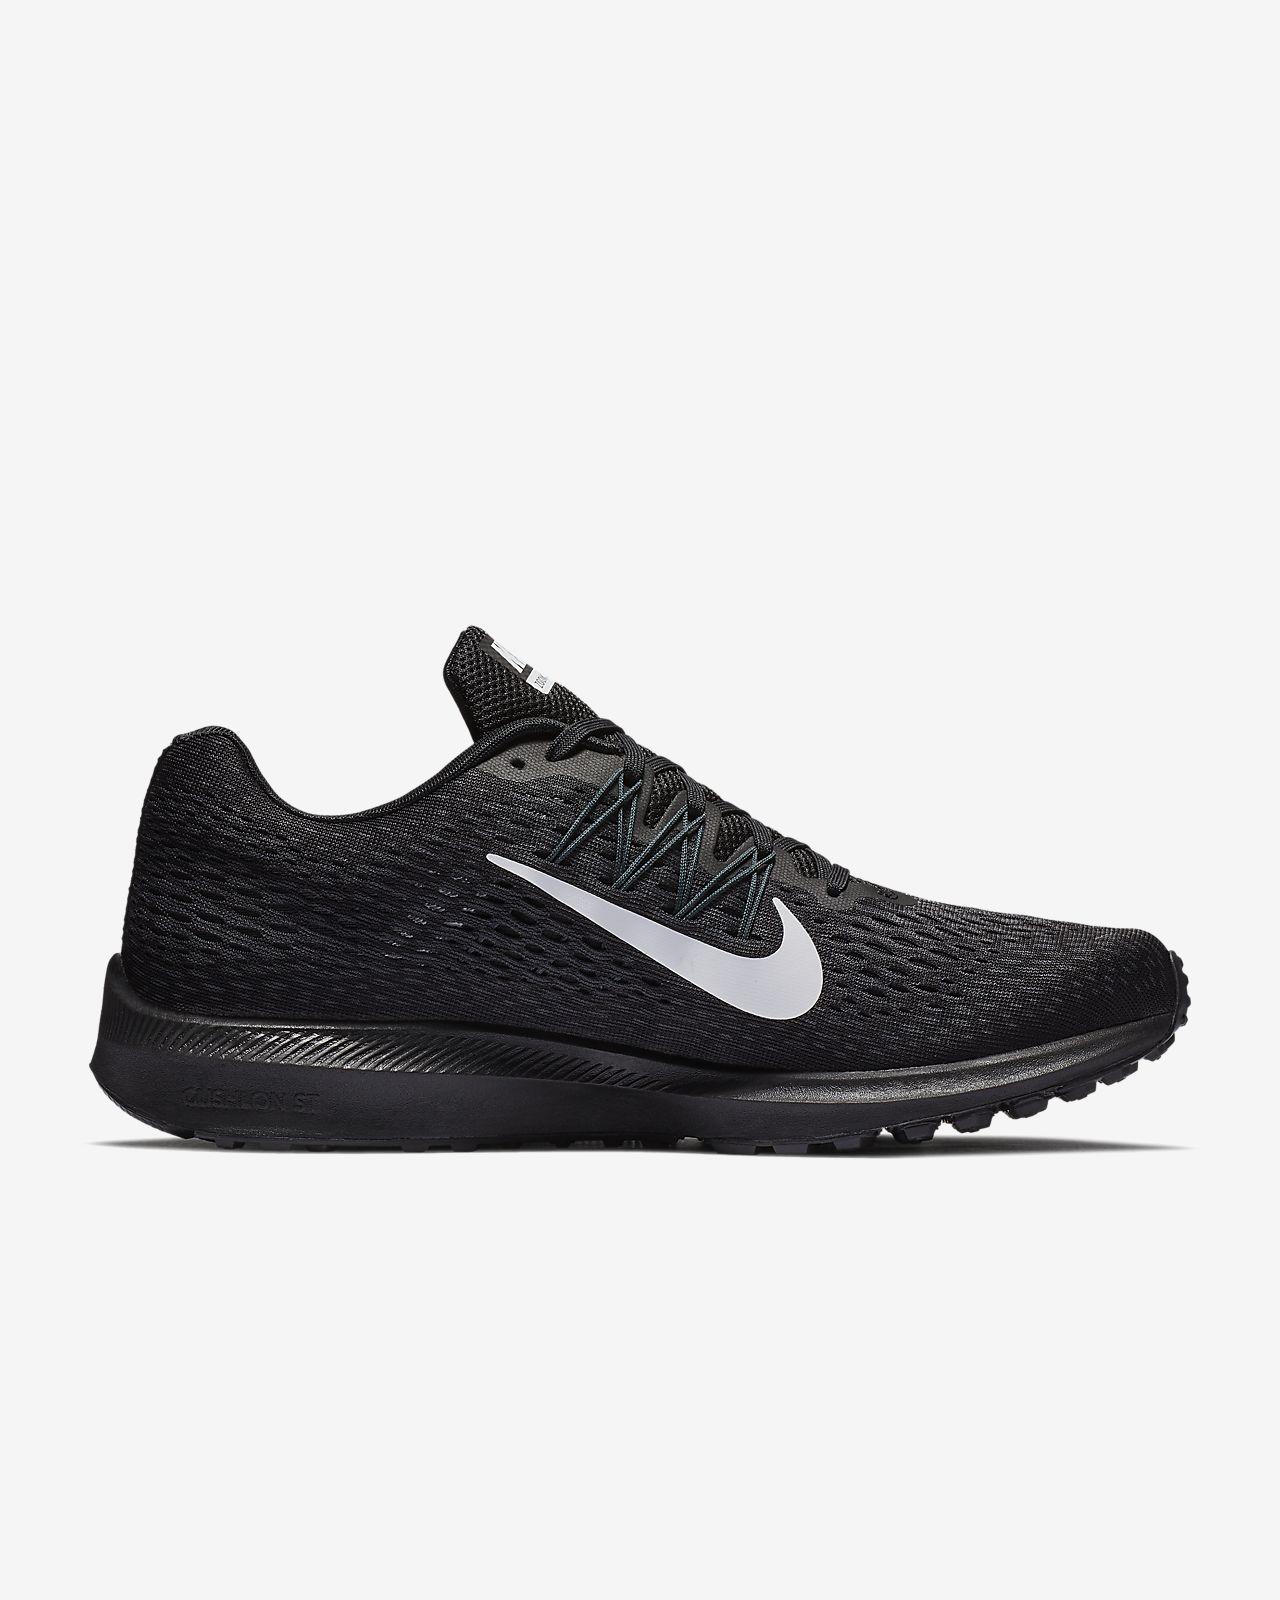 4e86595340ae Nike Air Zoom Winflo 5 Men s Running Shoe. Nike.com EG